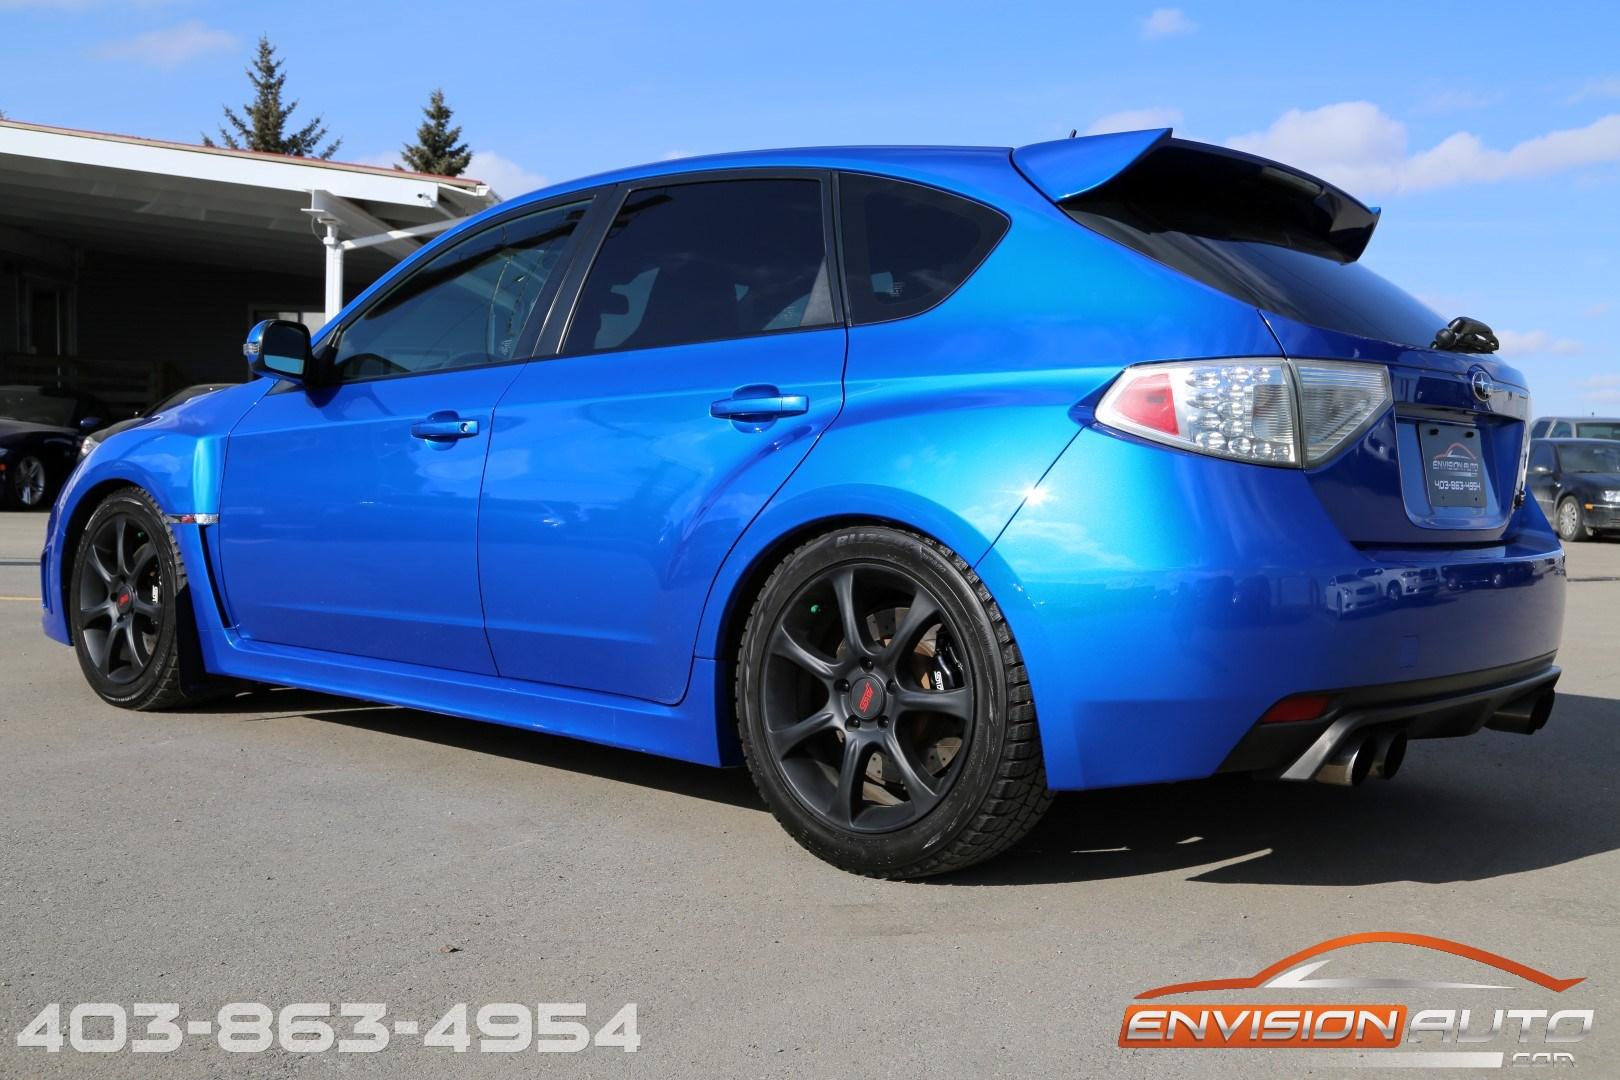 2010 Subaru Impreza Wrx Sti Custom Built Engine Only 90kms Envision Auto Calgary